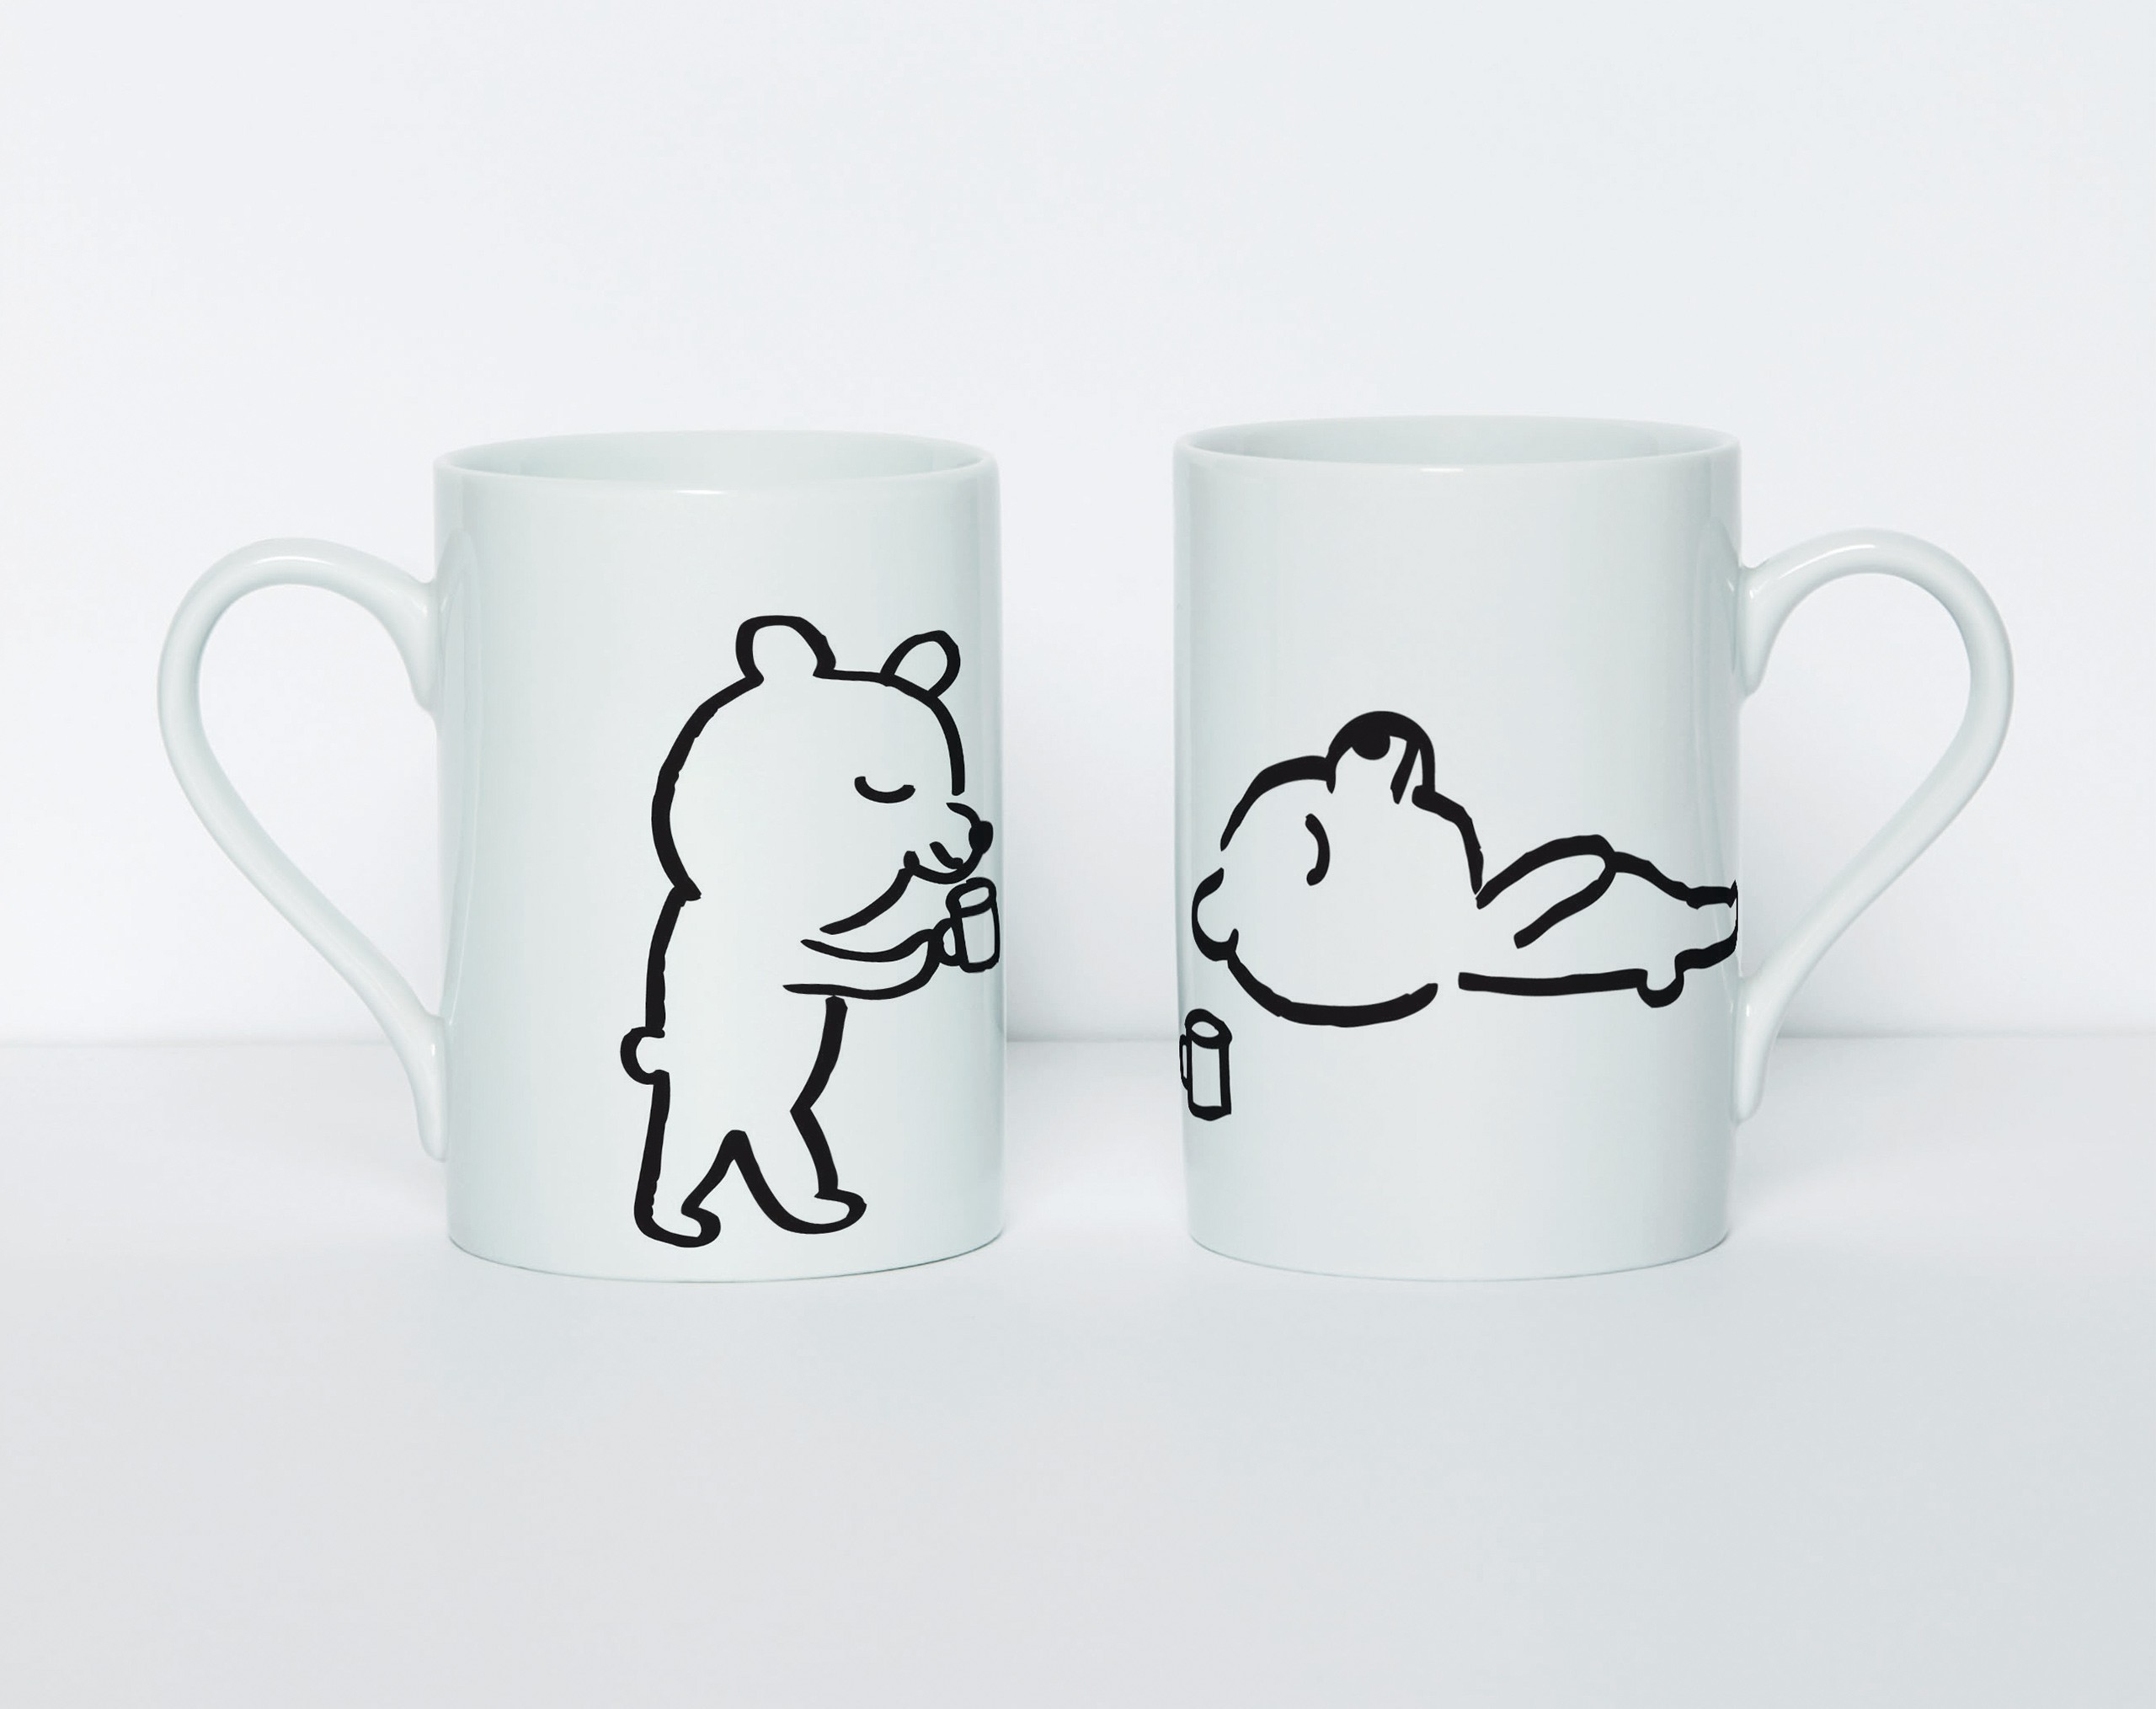 mug-design-domestic-iris_de_mouy-thirtsty-b